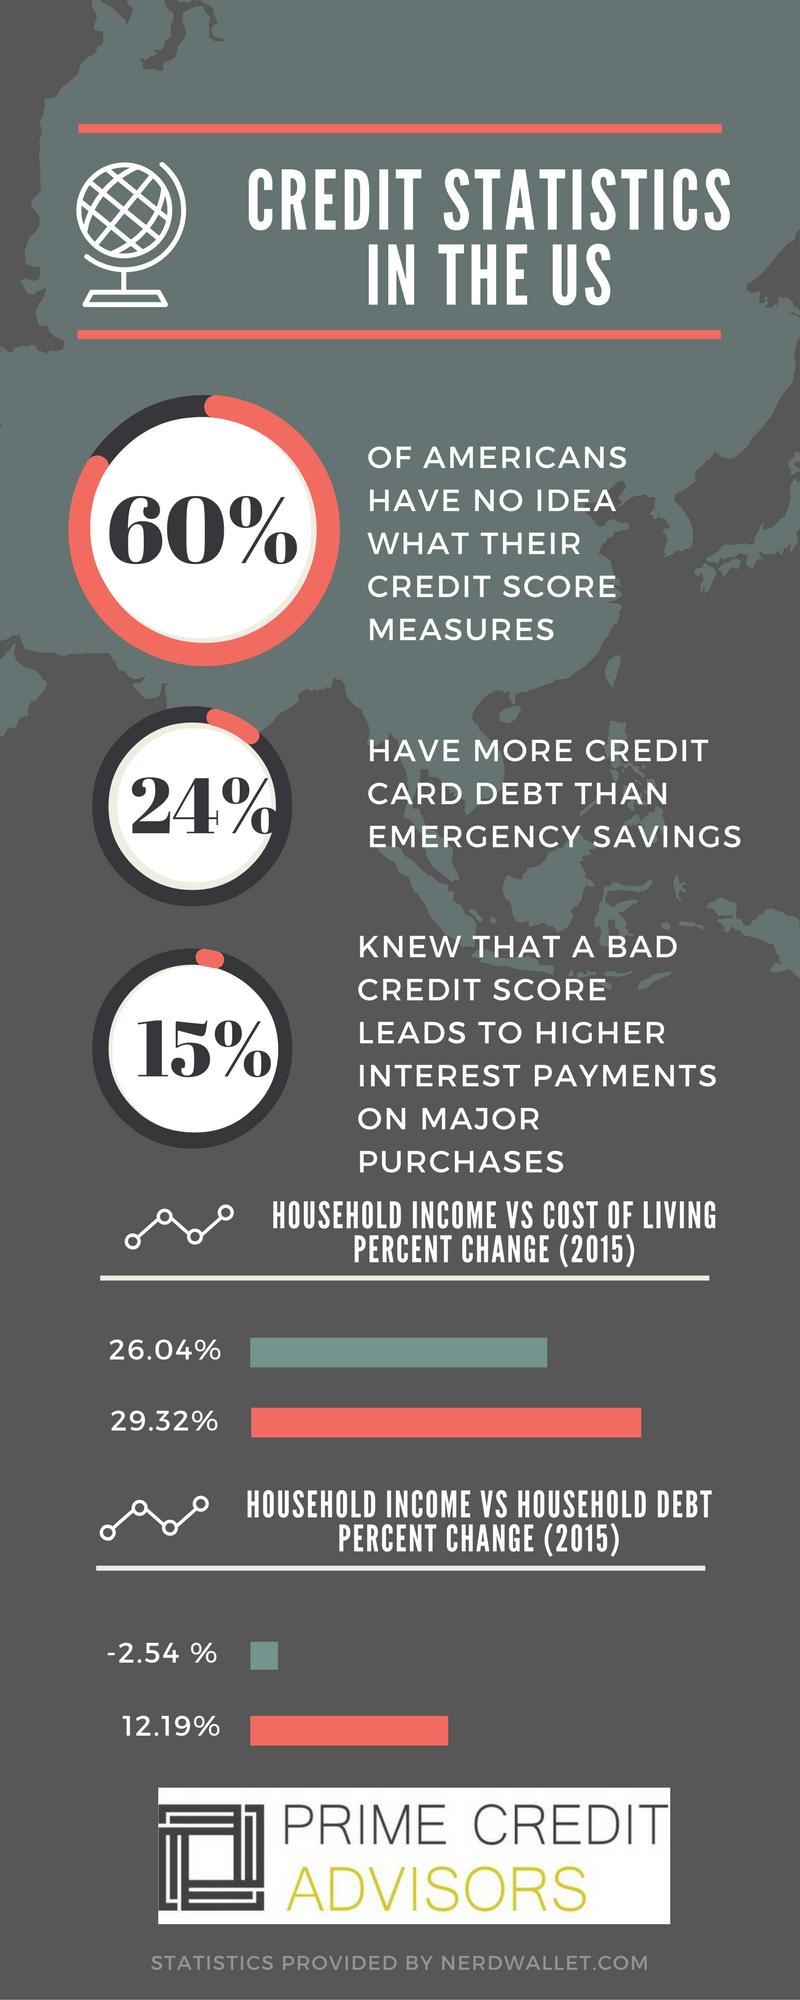 Credit Repair Services Augusta Me | Primecreditadvisors | Prime Credit Advisors